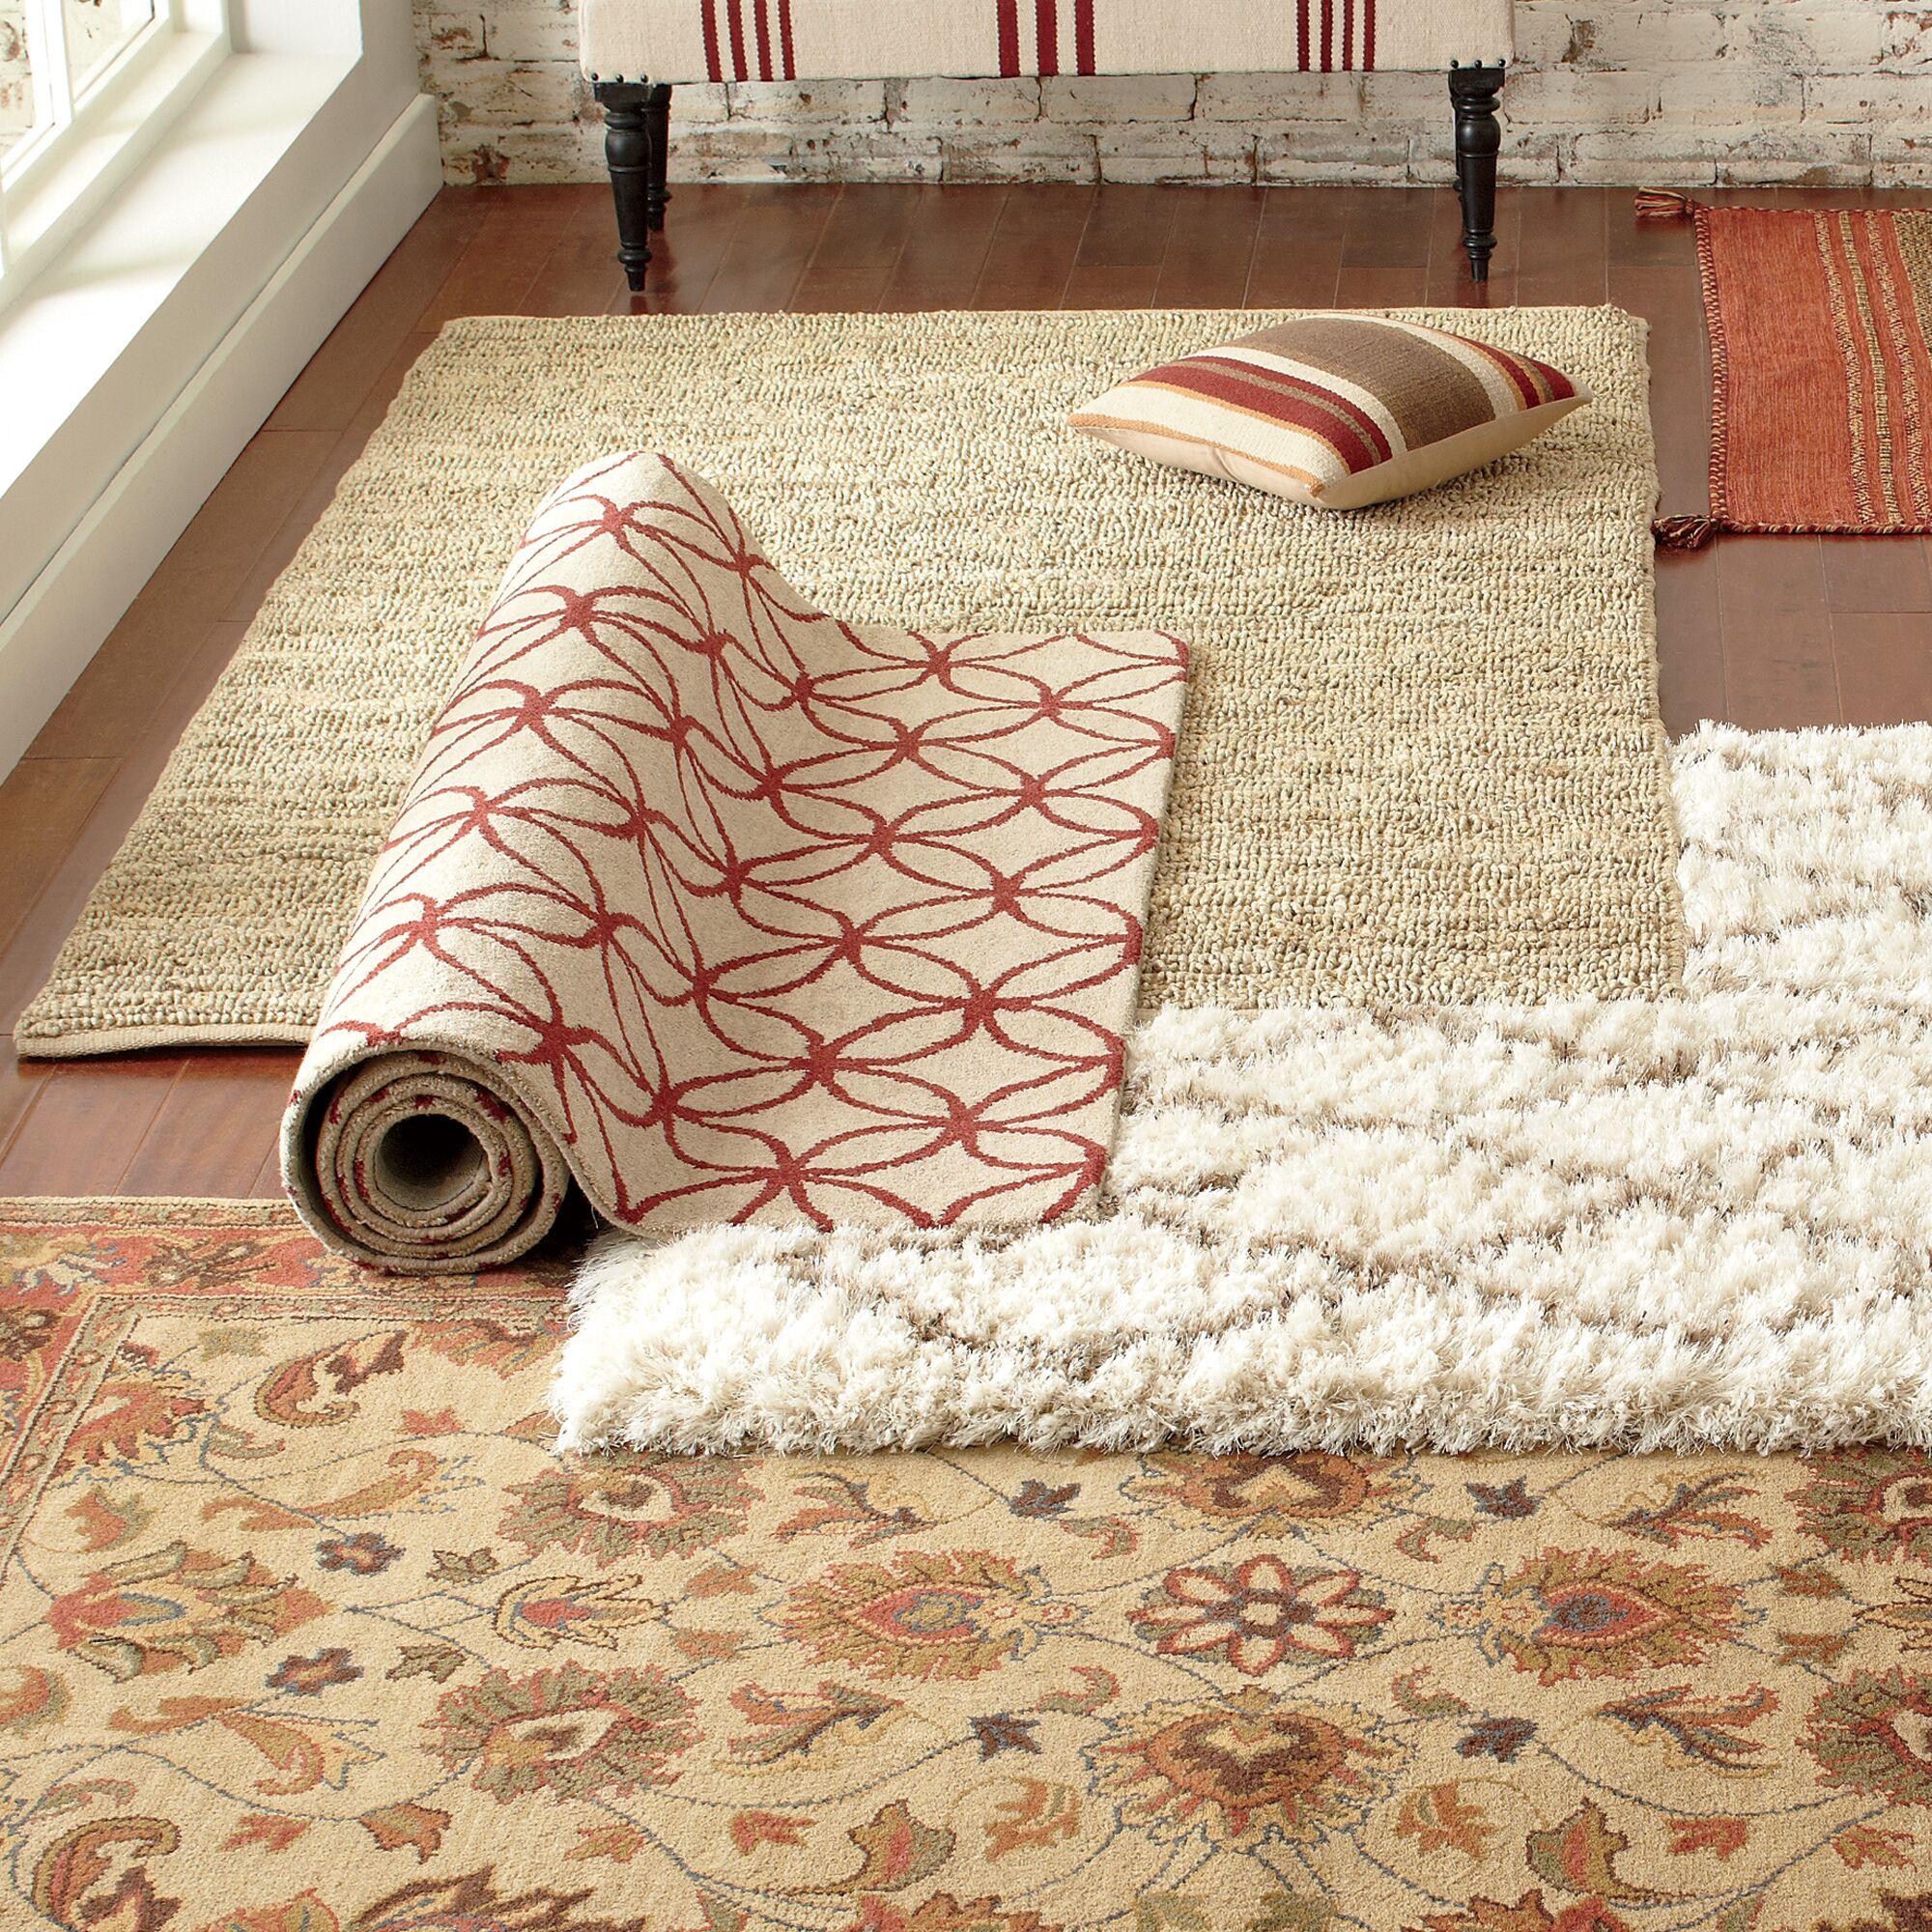 Hadley Hand Woven Natural/Turtledove Area Rug Rug Size: Rectangle 2'6